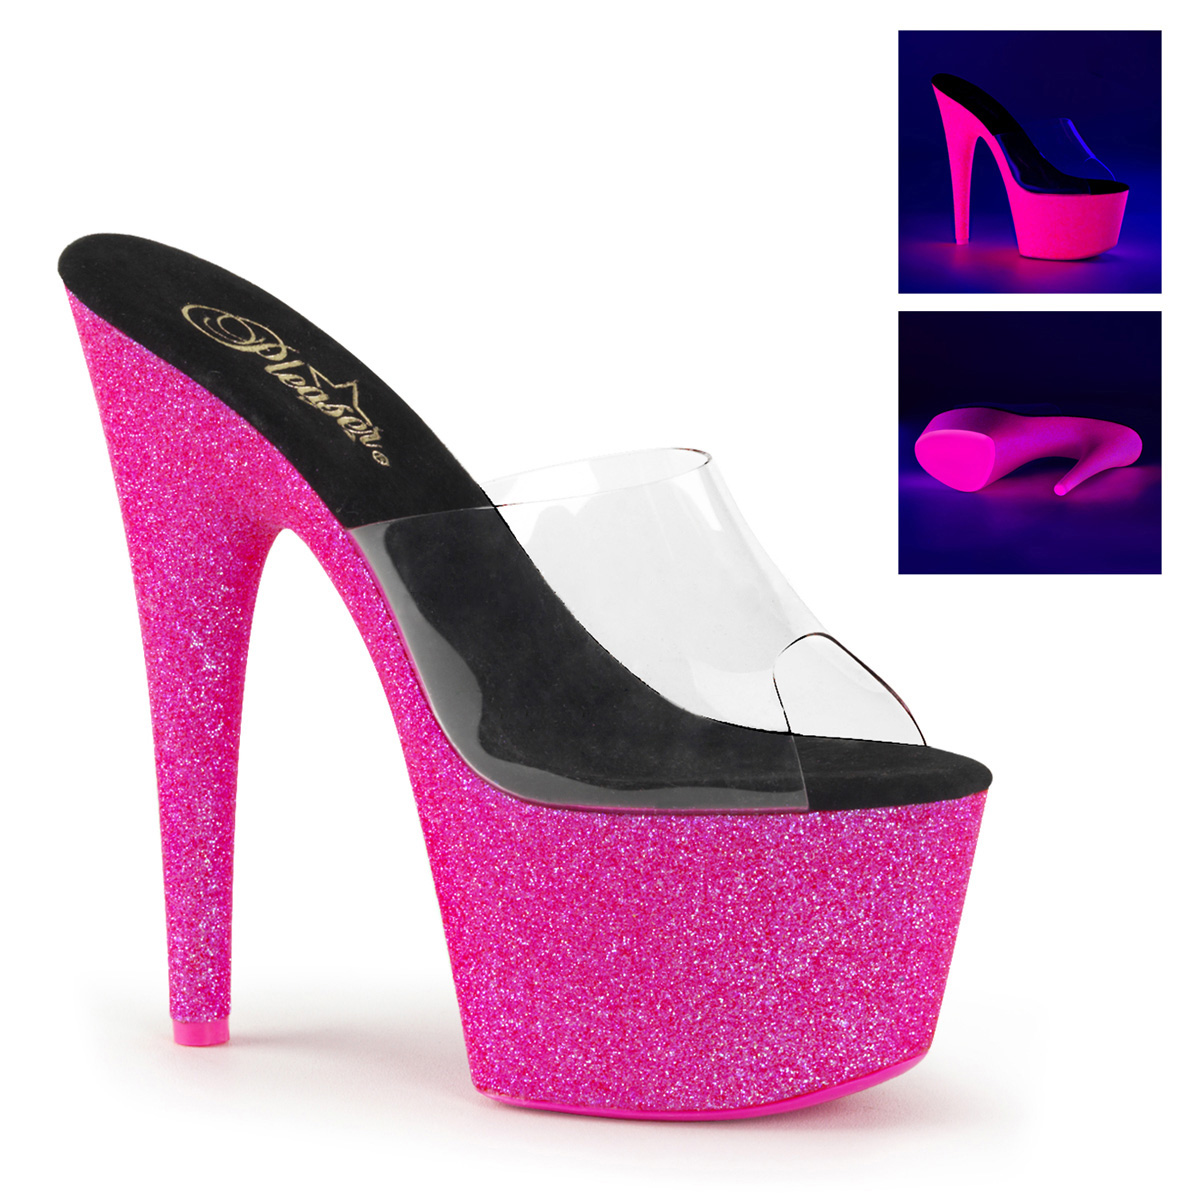 Pleaser SKY-301-5 Damen Plateau Pantolette, Neon Pink, EU 41.5 (US 11)